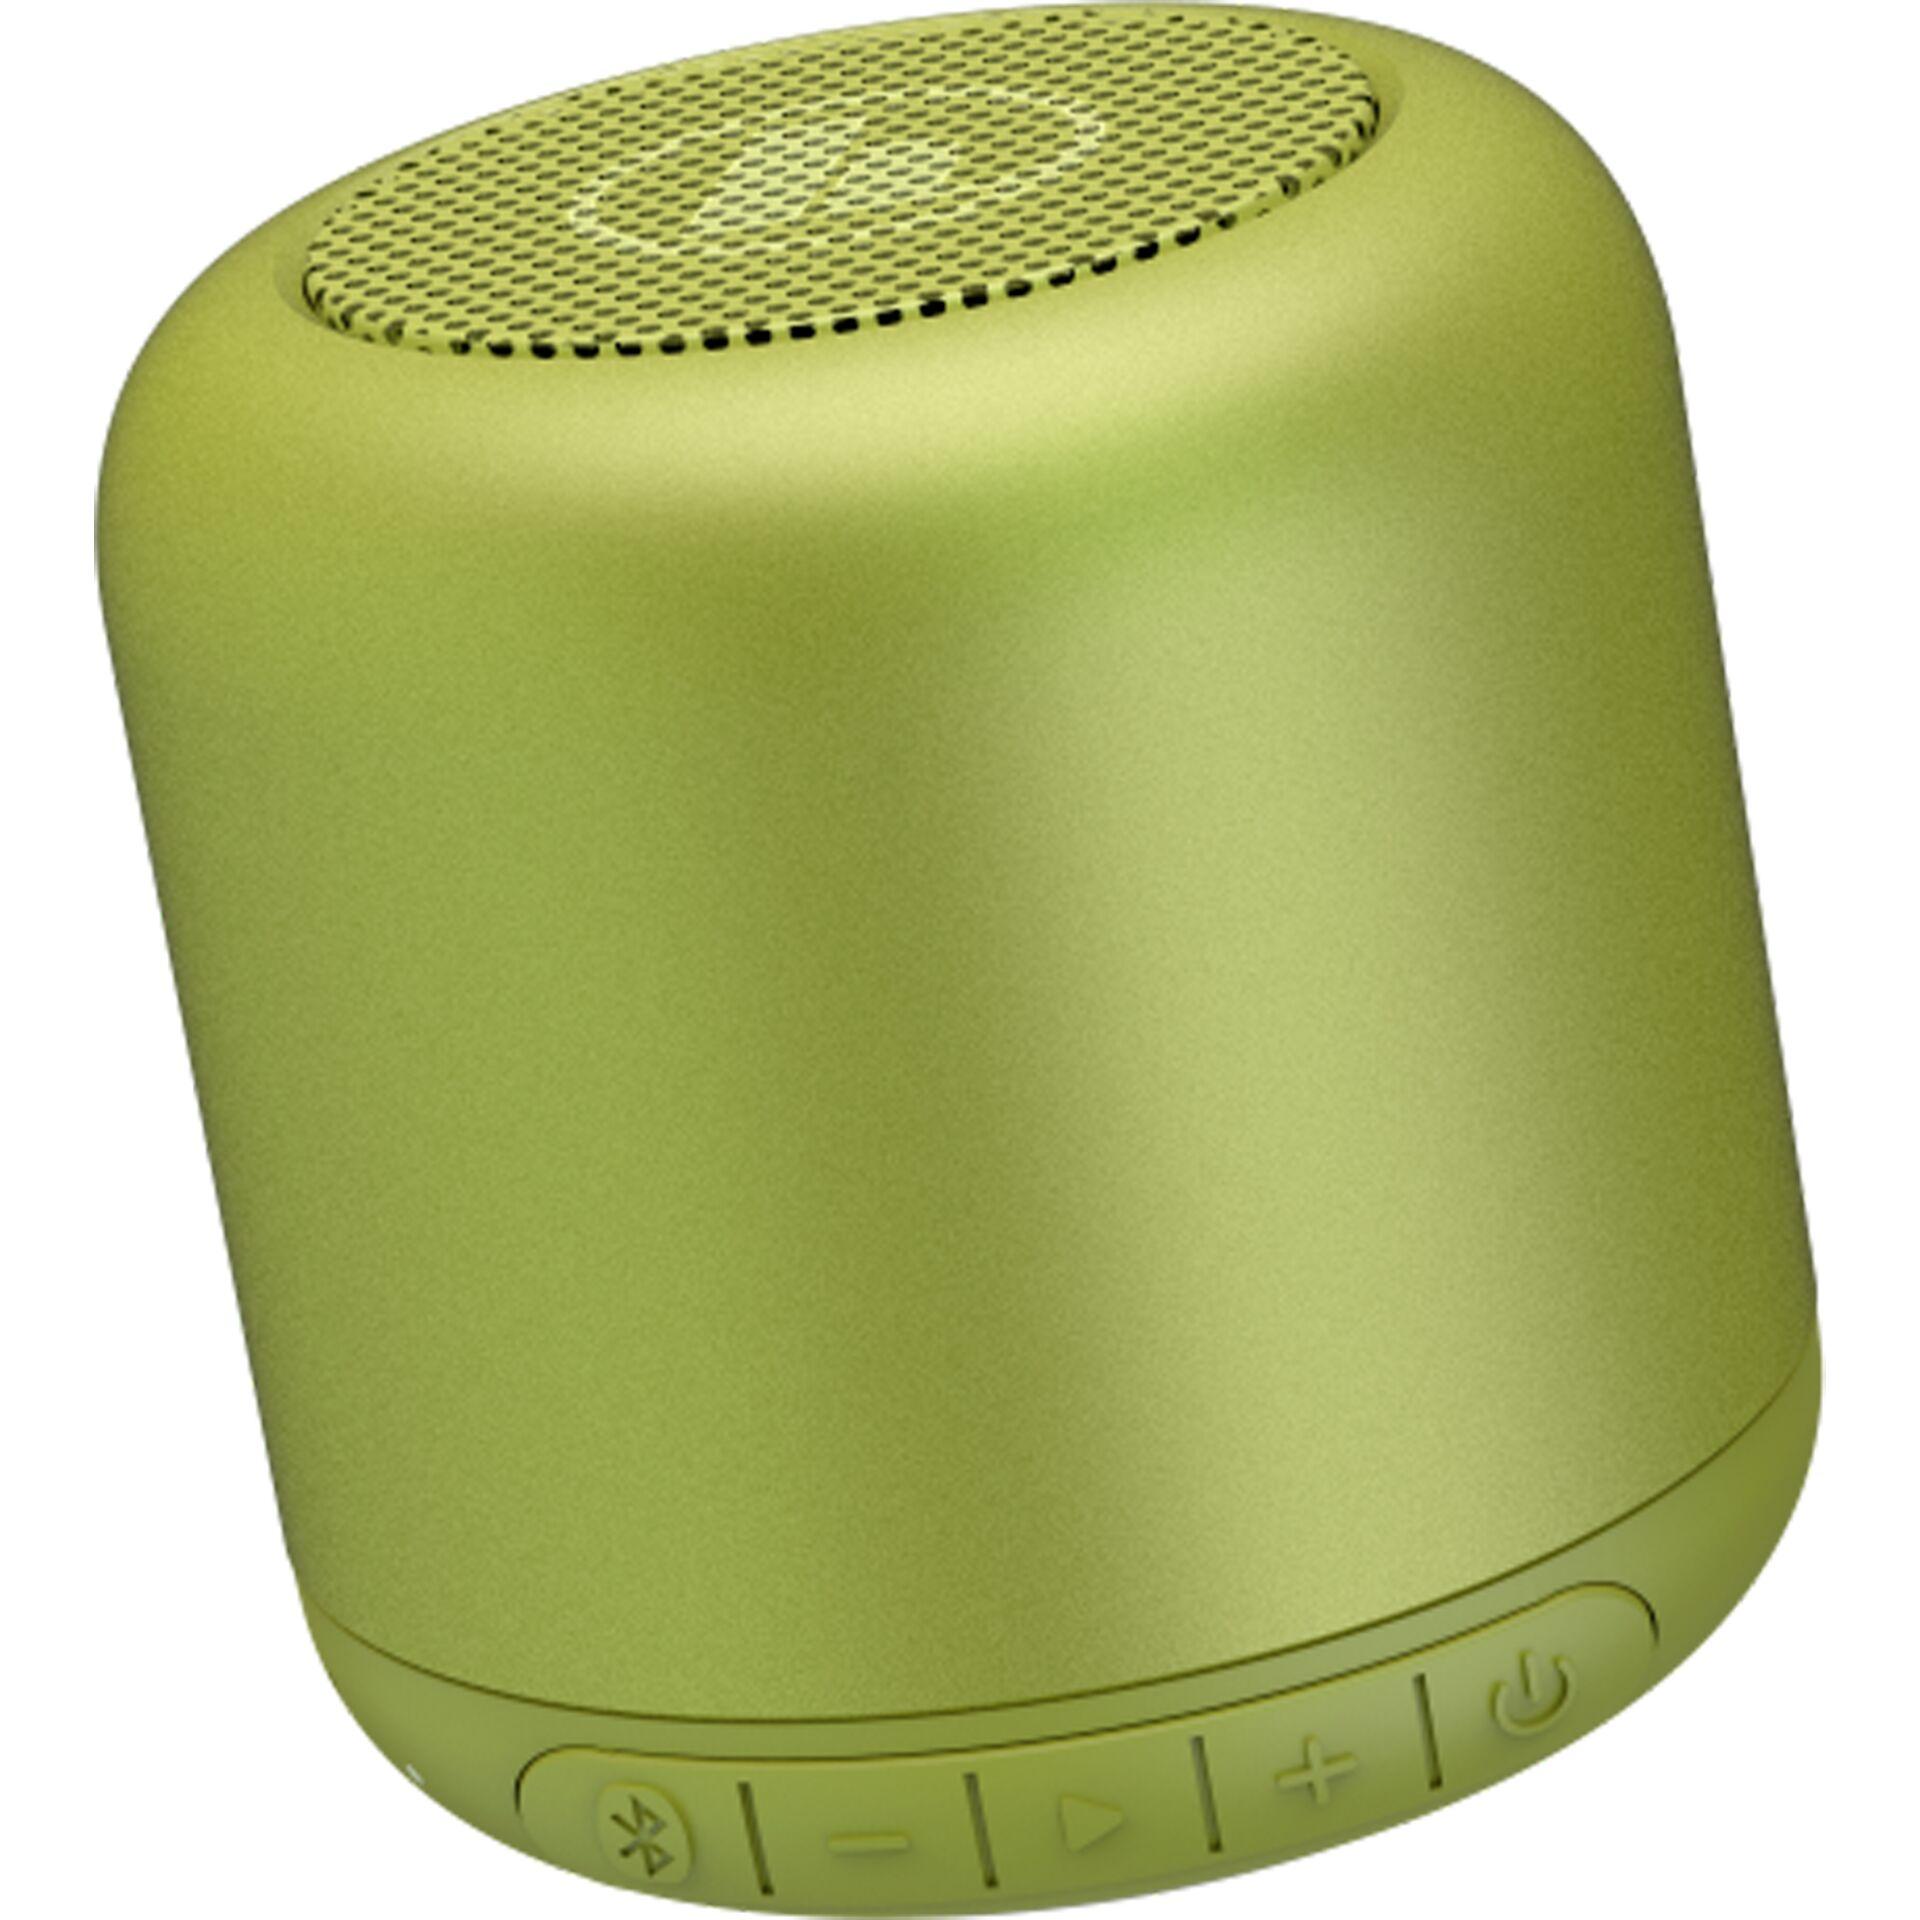 Hama Drum 2.0 Mobile Bluetooth Speakers lime